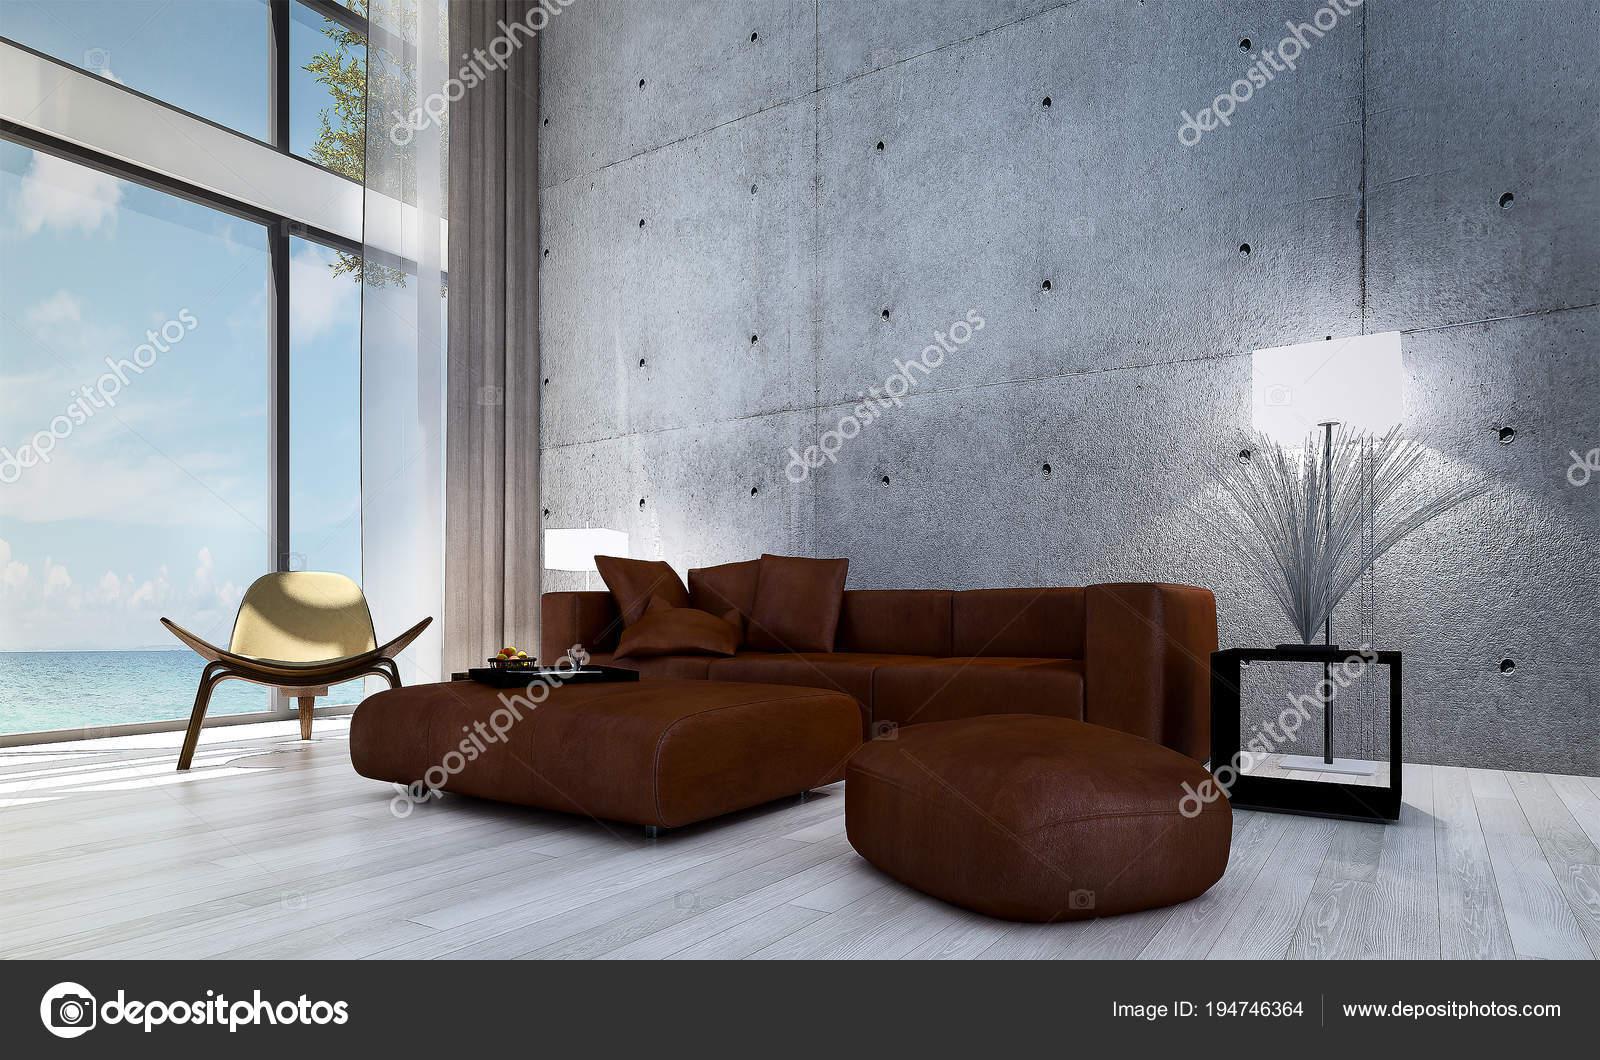 Woonkamer Met Beton : Het interieur van woonkamer beton patroon wanddecoratie zee